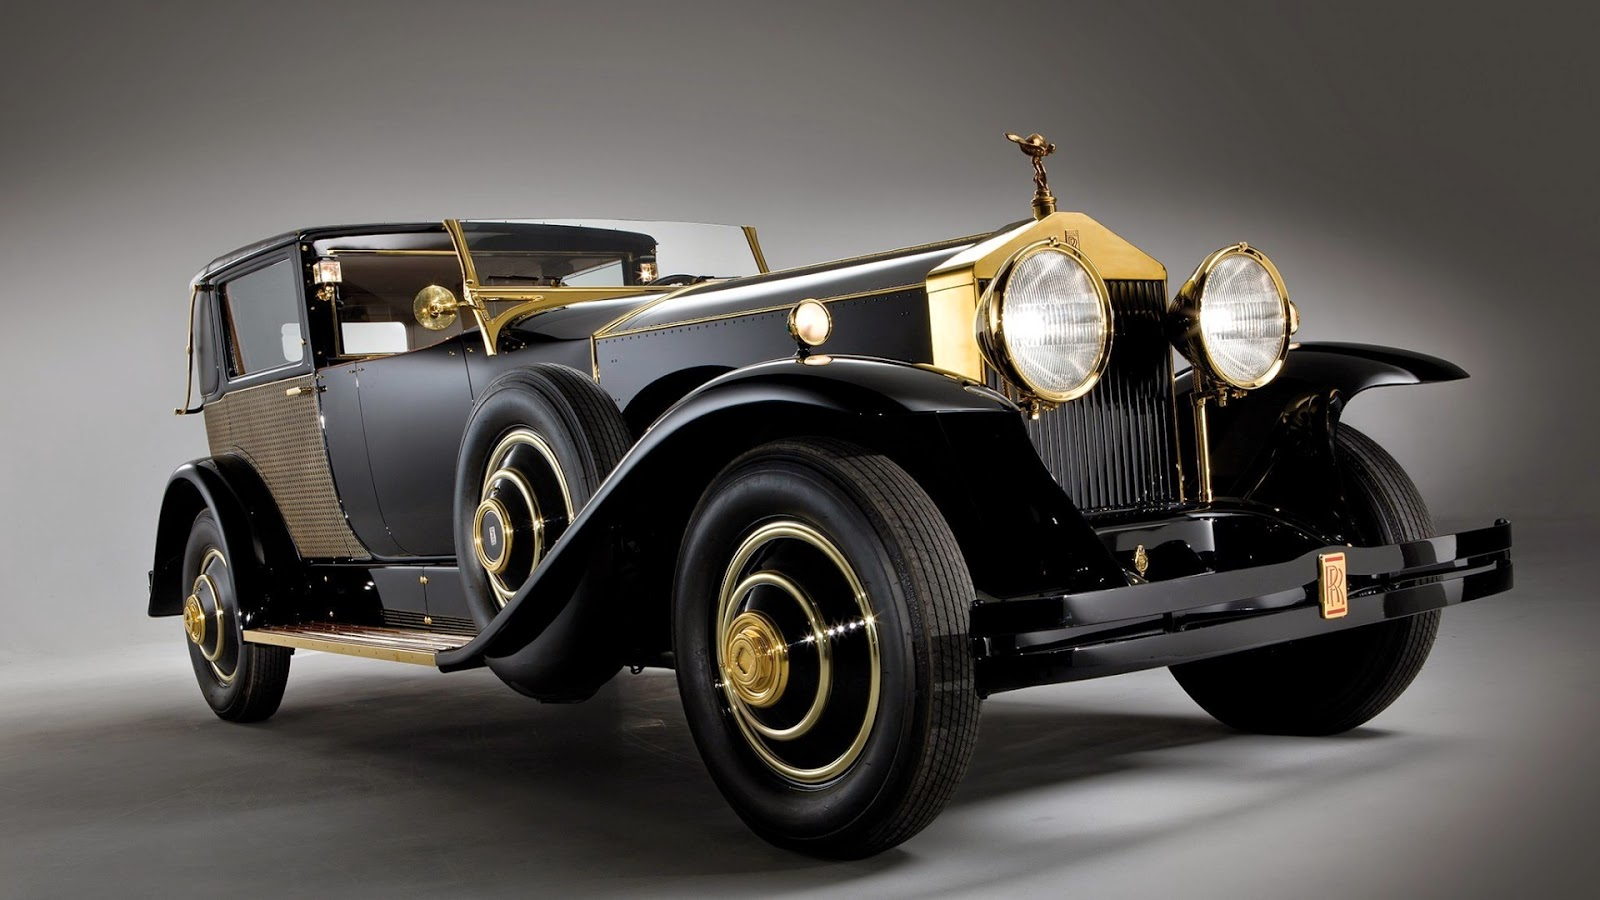 Rolls royce cars 23 background for Rolls royce motor cars